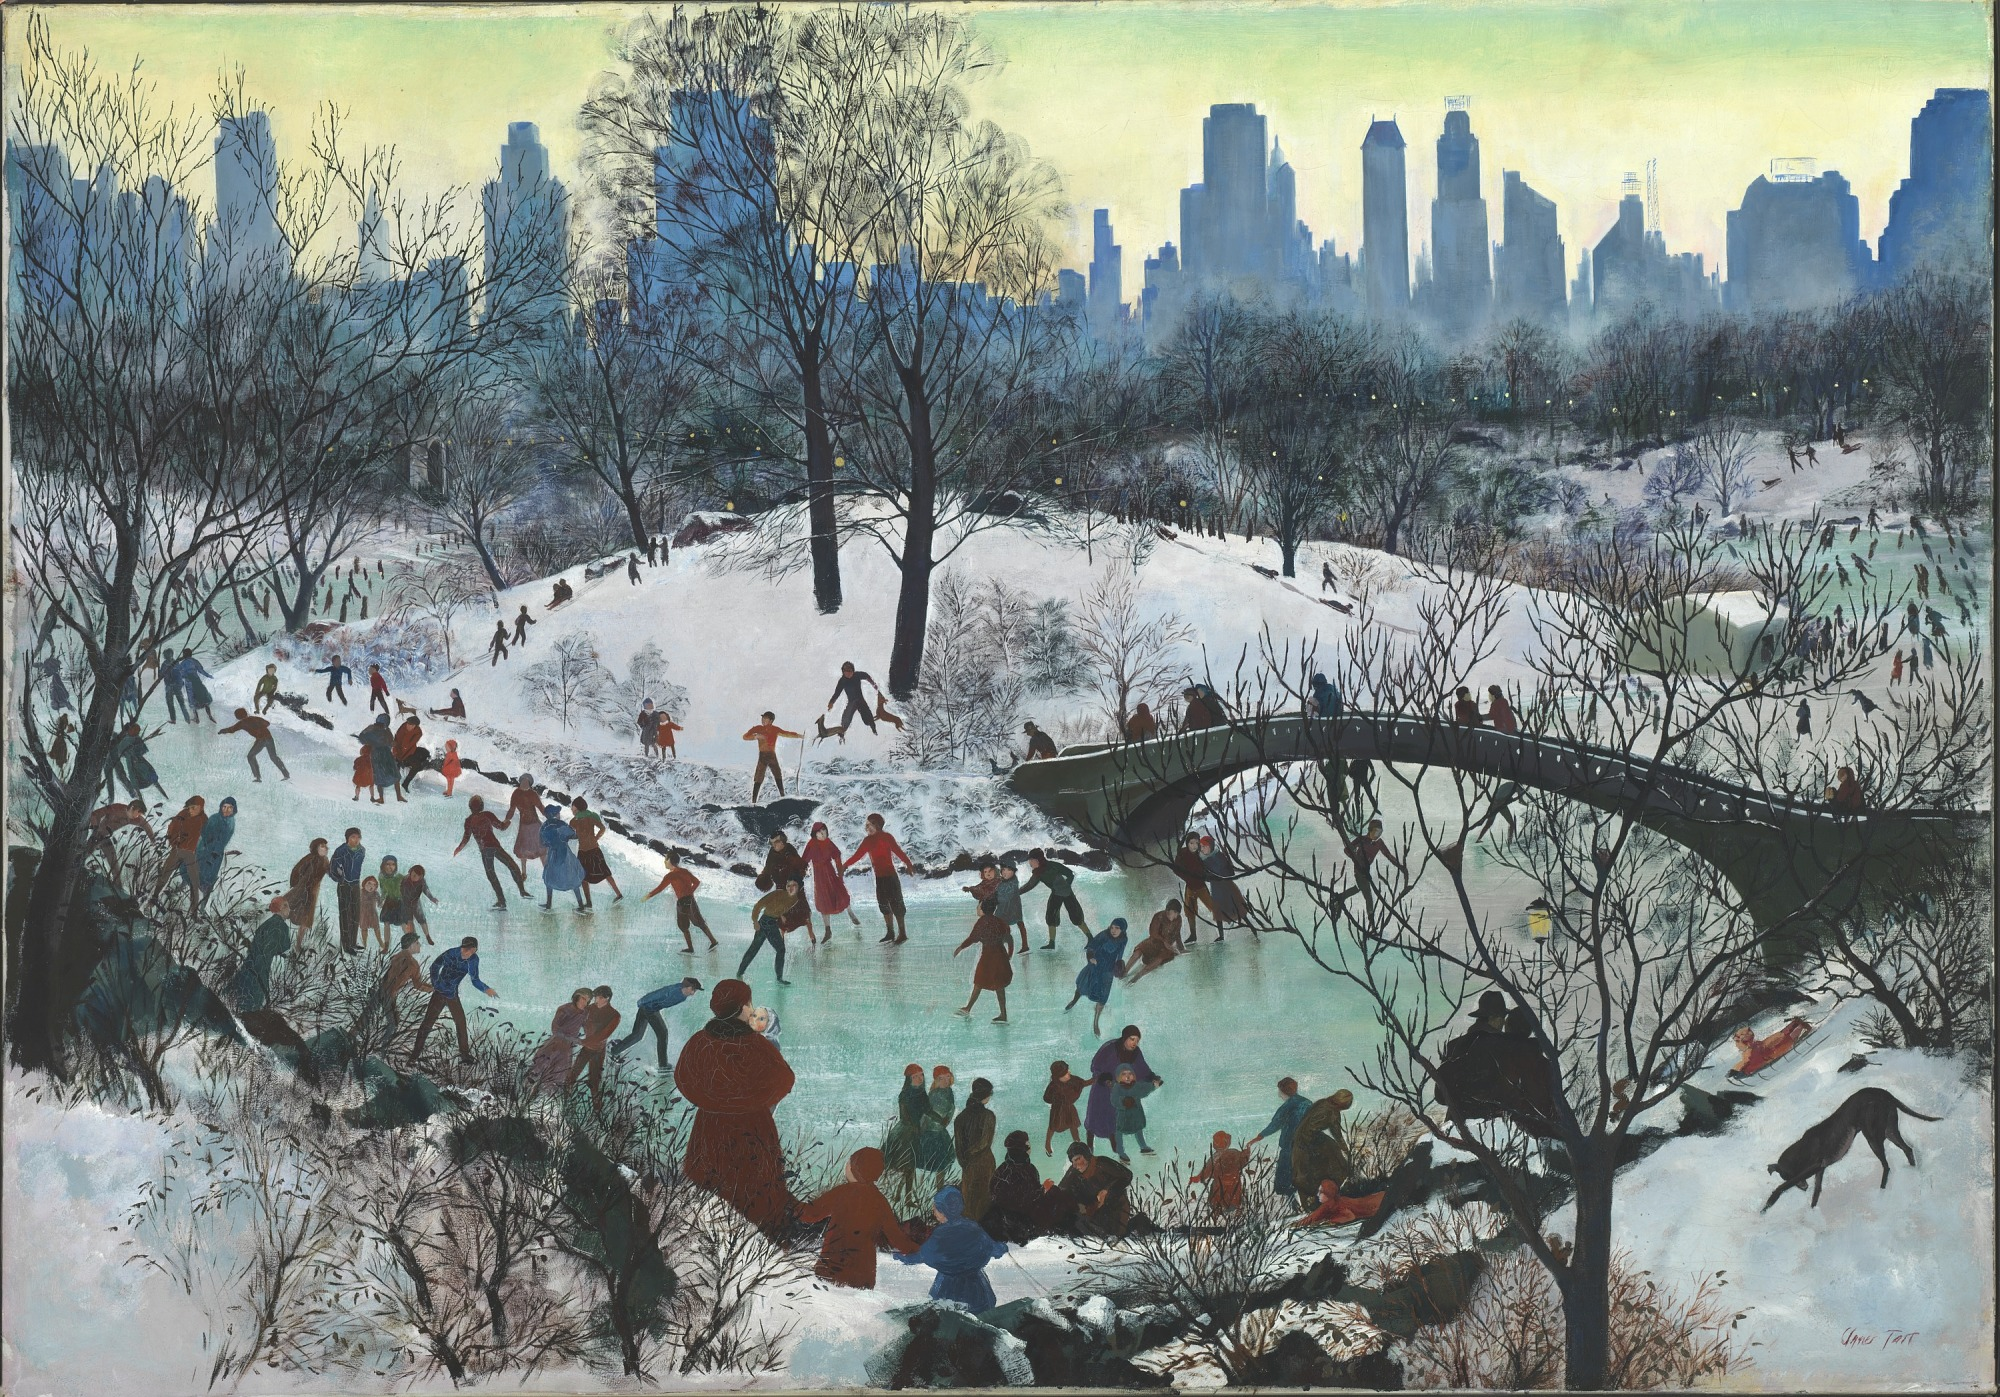 images for Skating in Central Park